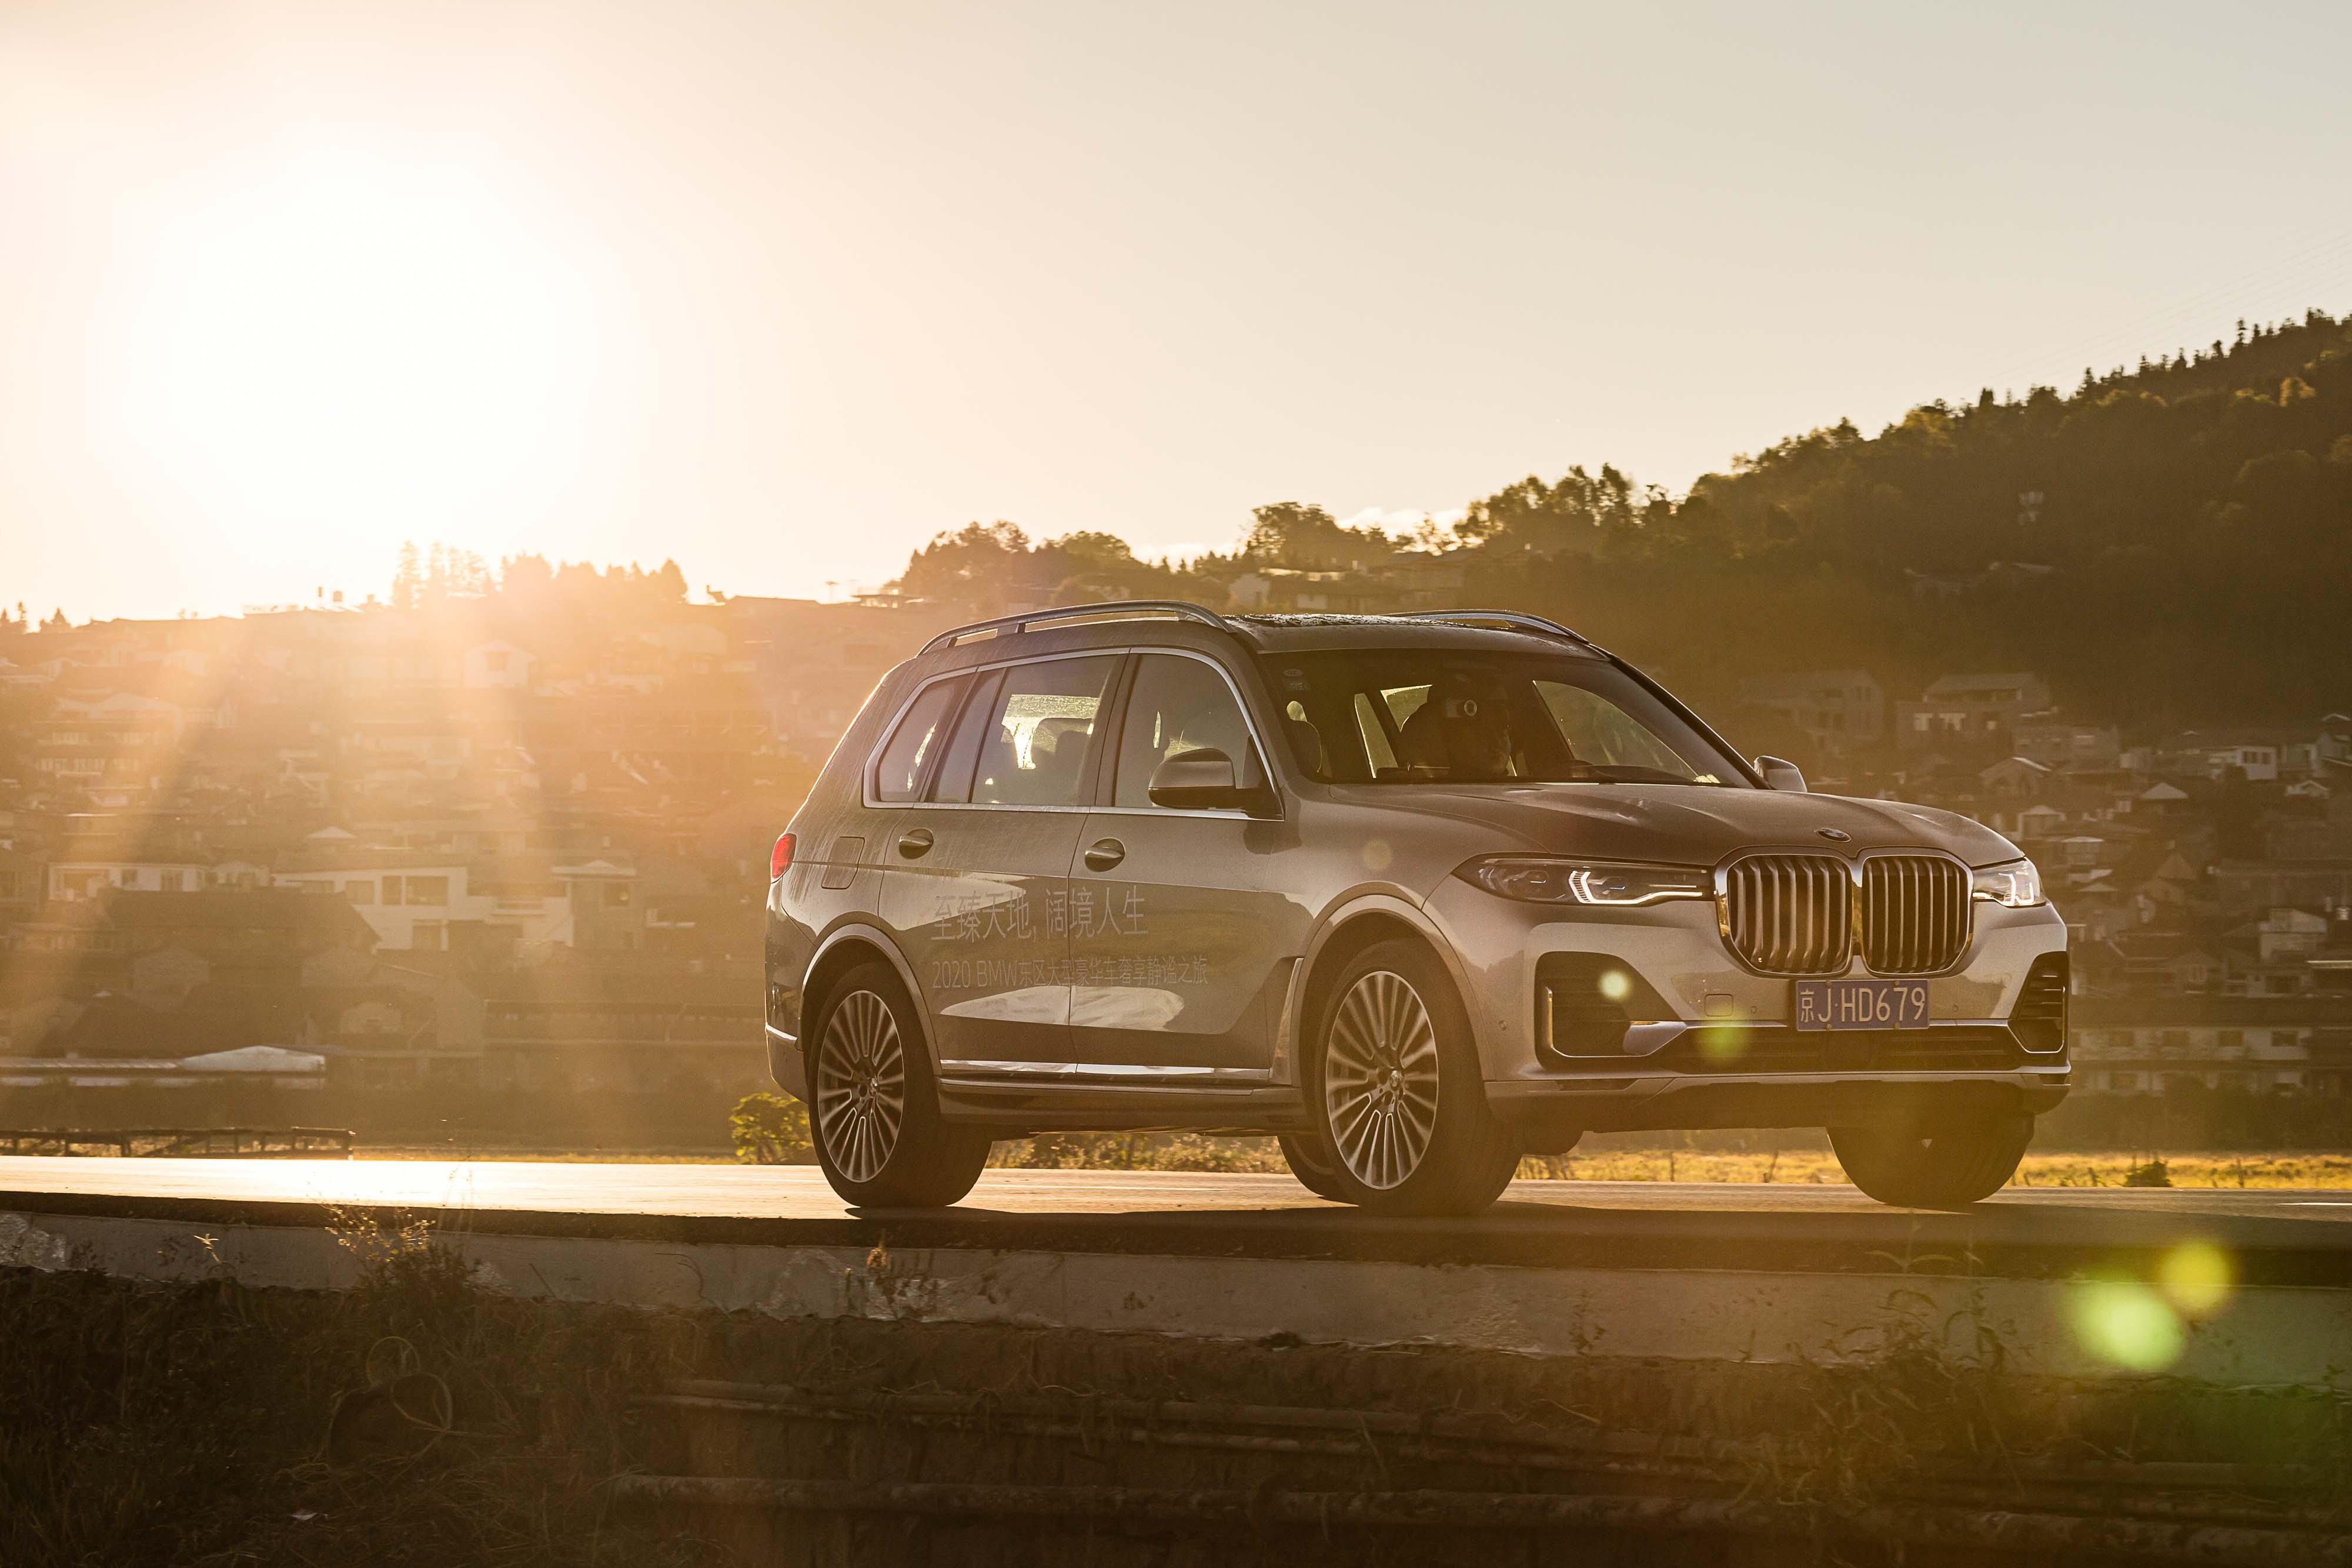 2020 BMW东区大型豪华车奢享静谧之旅悦然启程